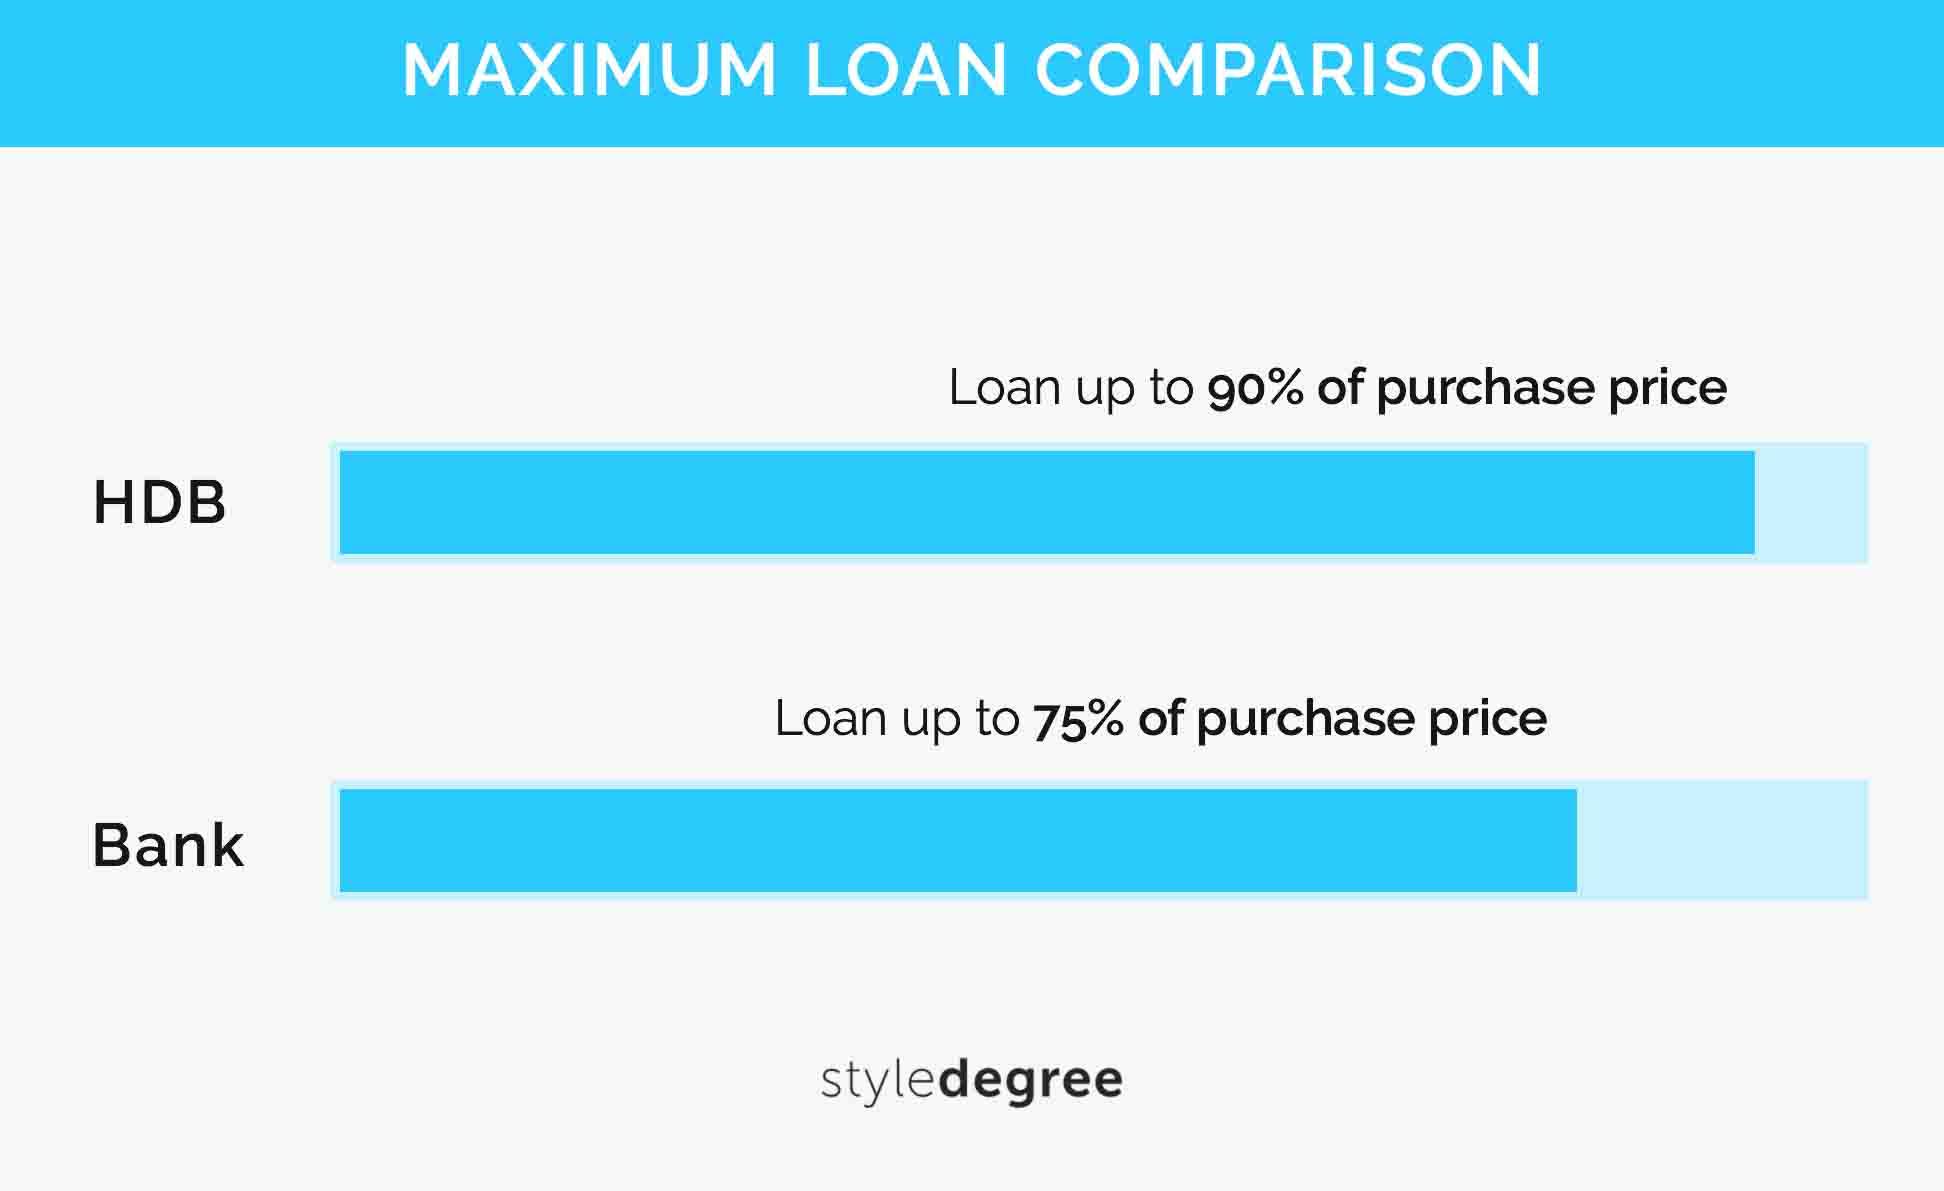 BTO Guide Loans Loan Downpayment Schemes HDB Bank Style Degree Sg Singapore